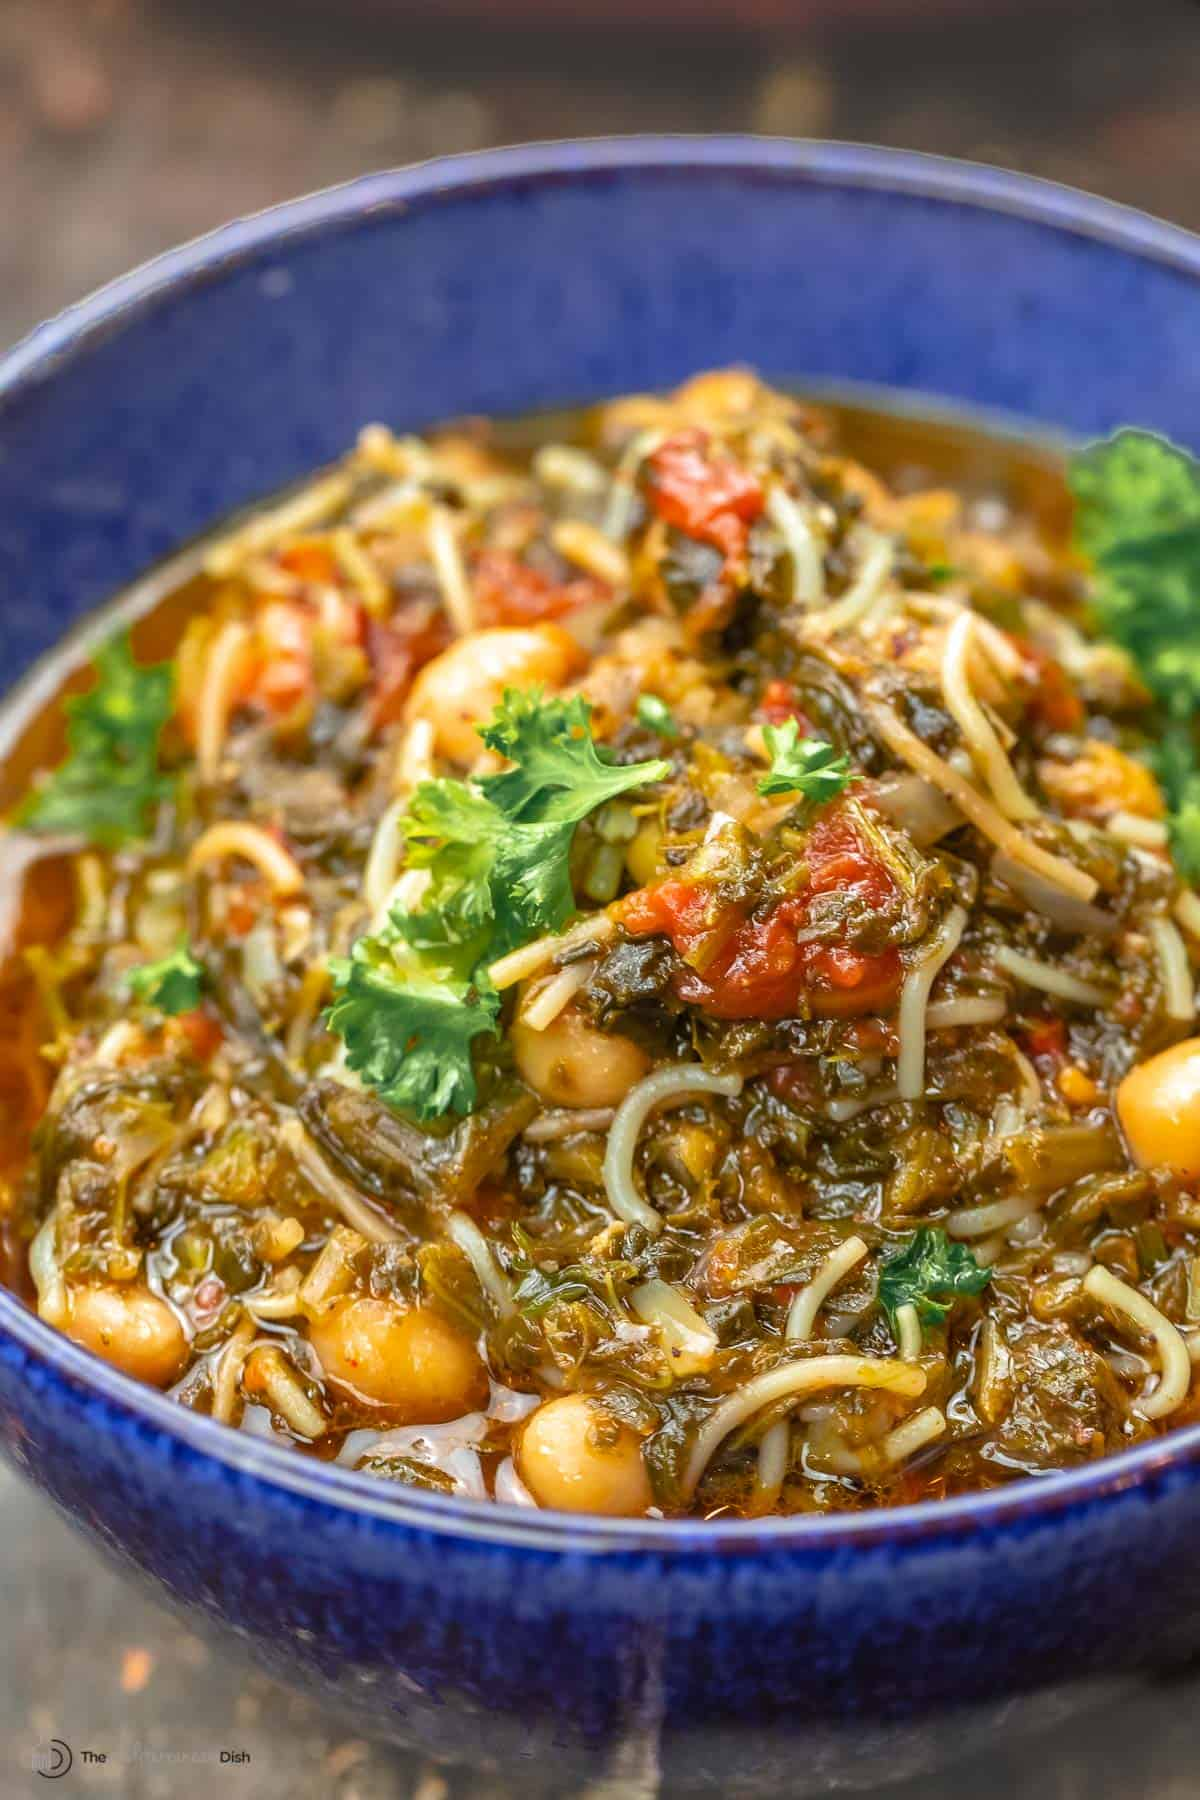 A blue bowl of Mediterranean spinach stew